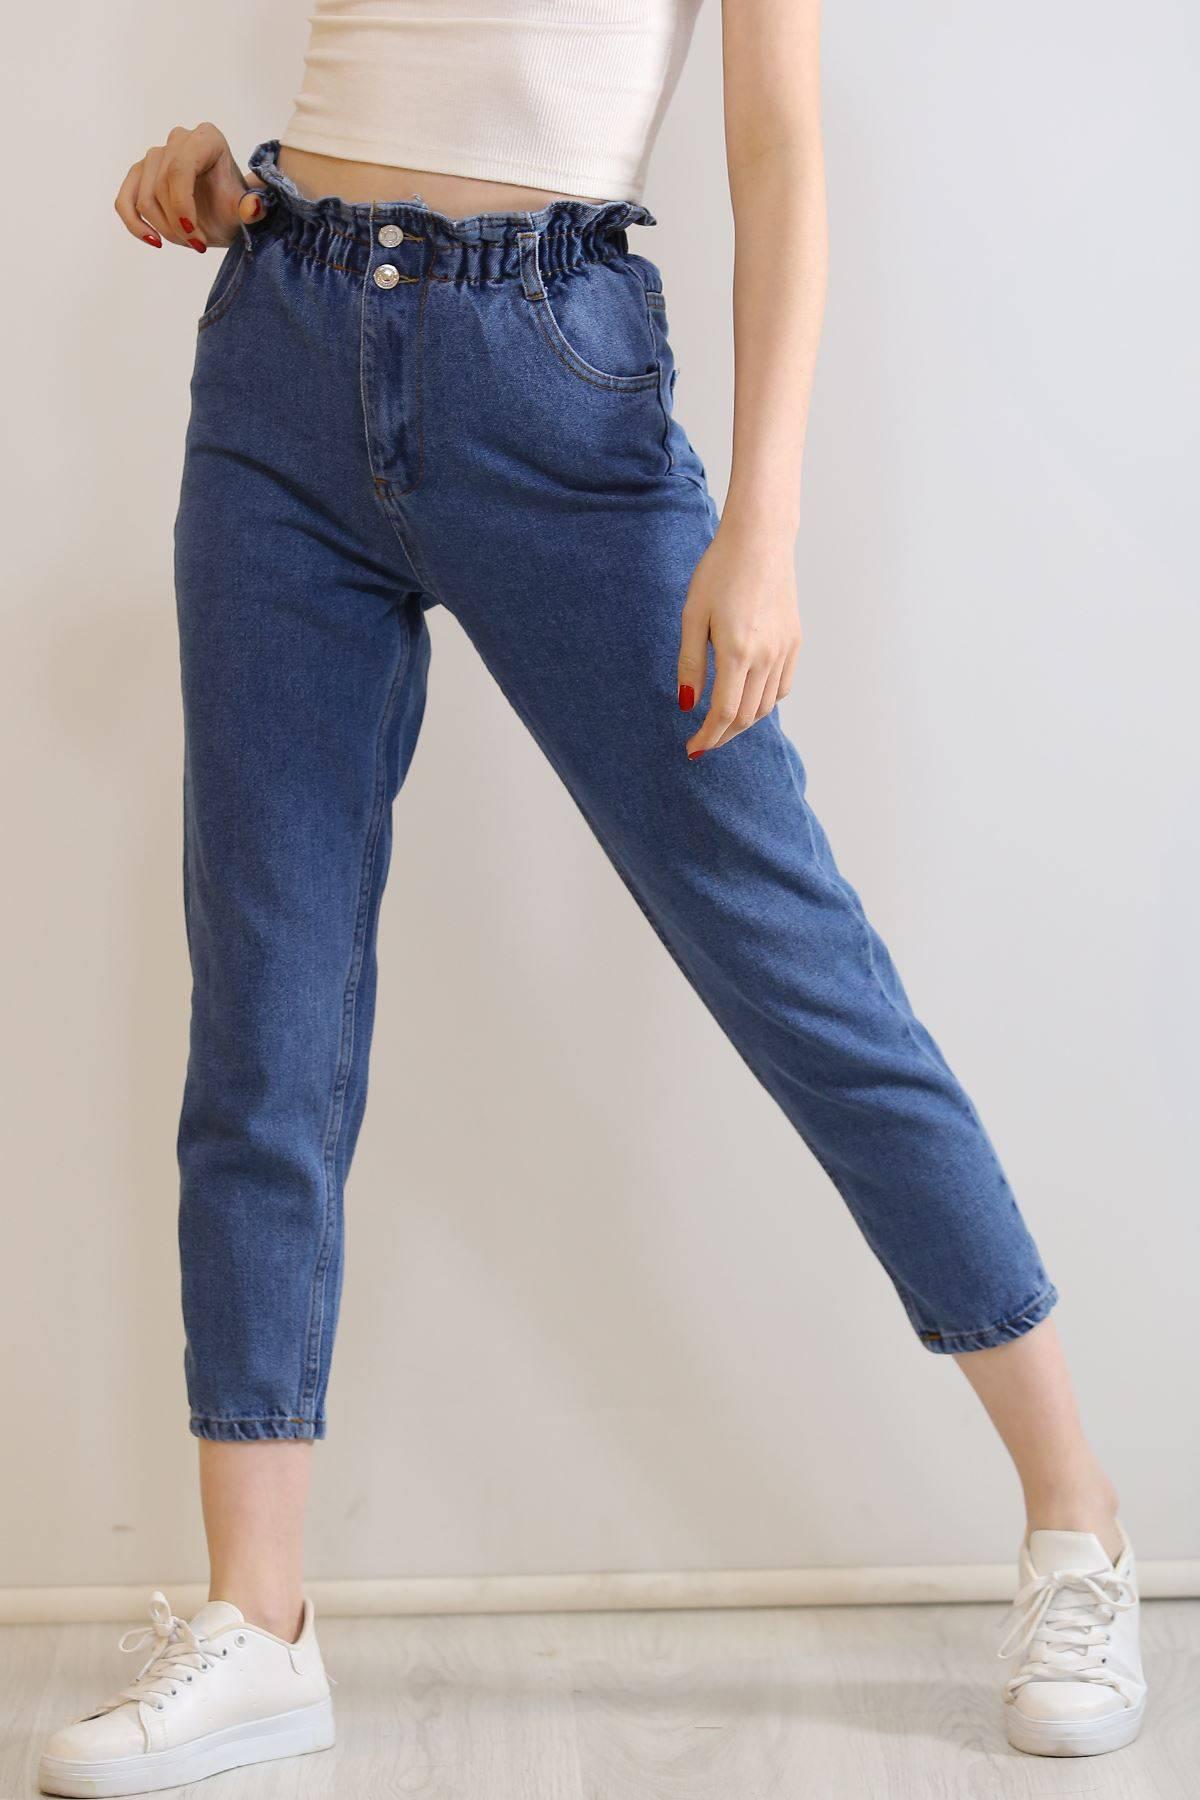 Çift Düğmeli  Kot Pantolon Mavi - 5862.299.